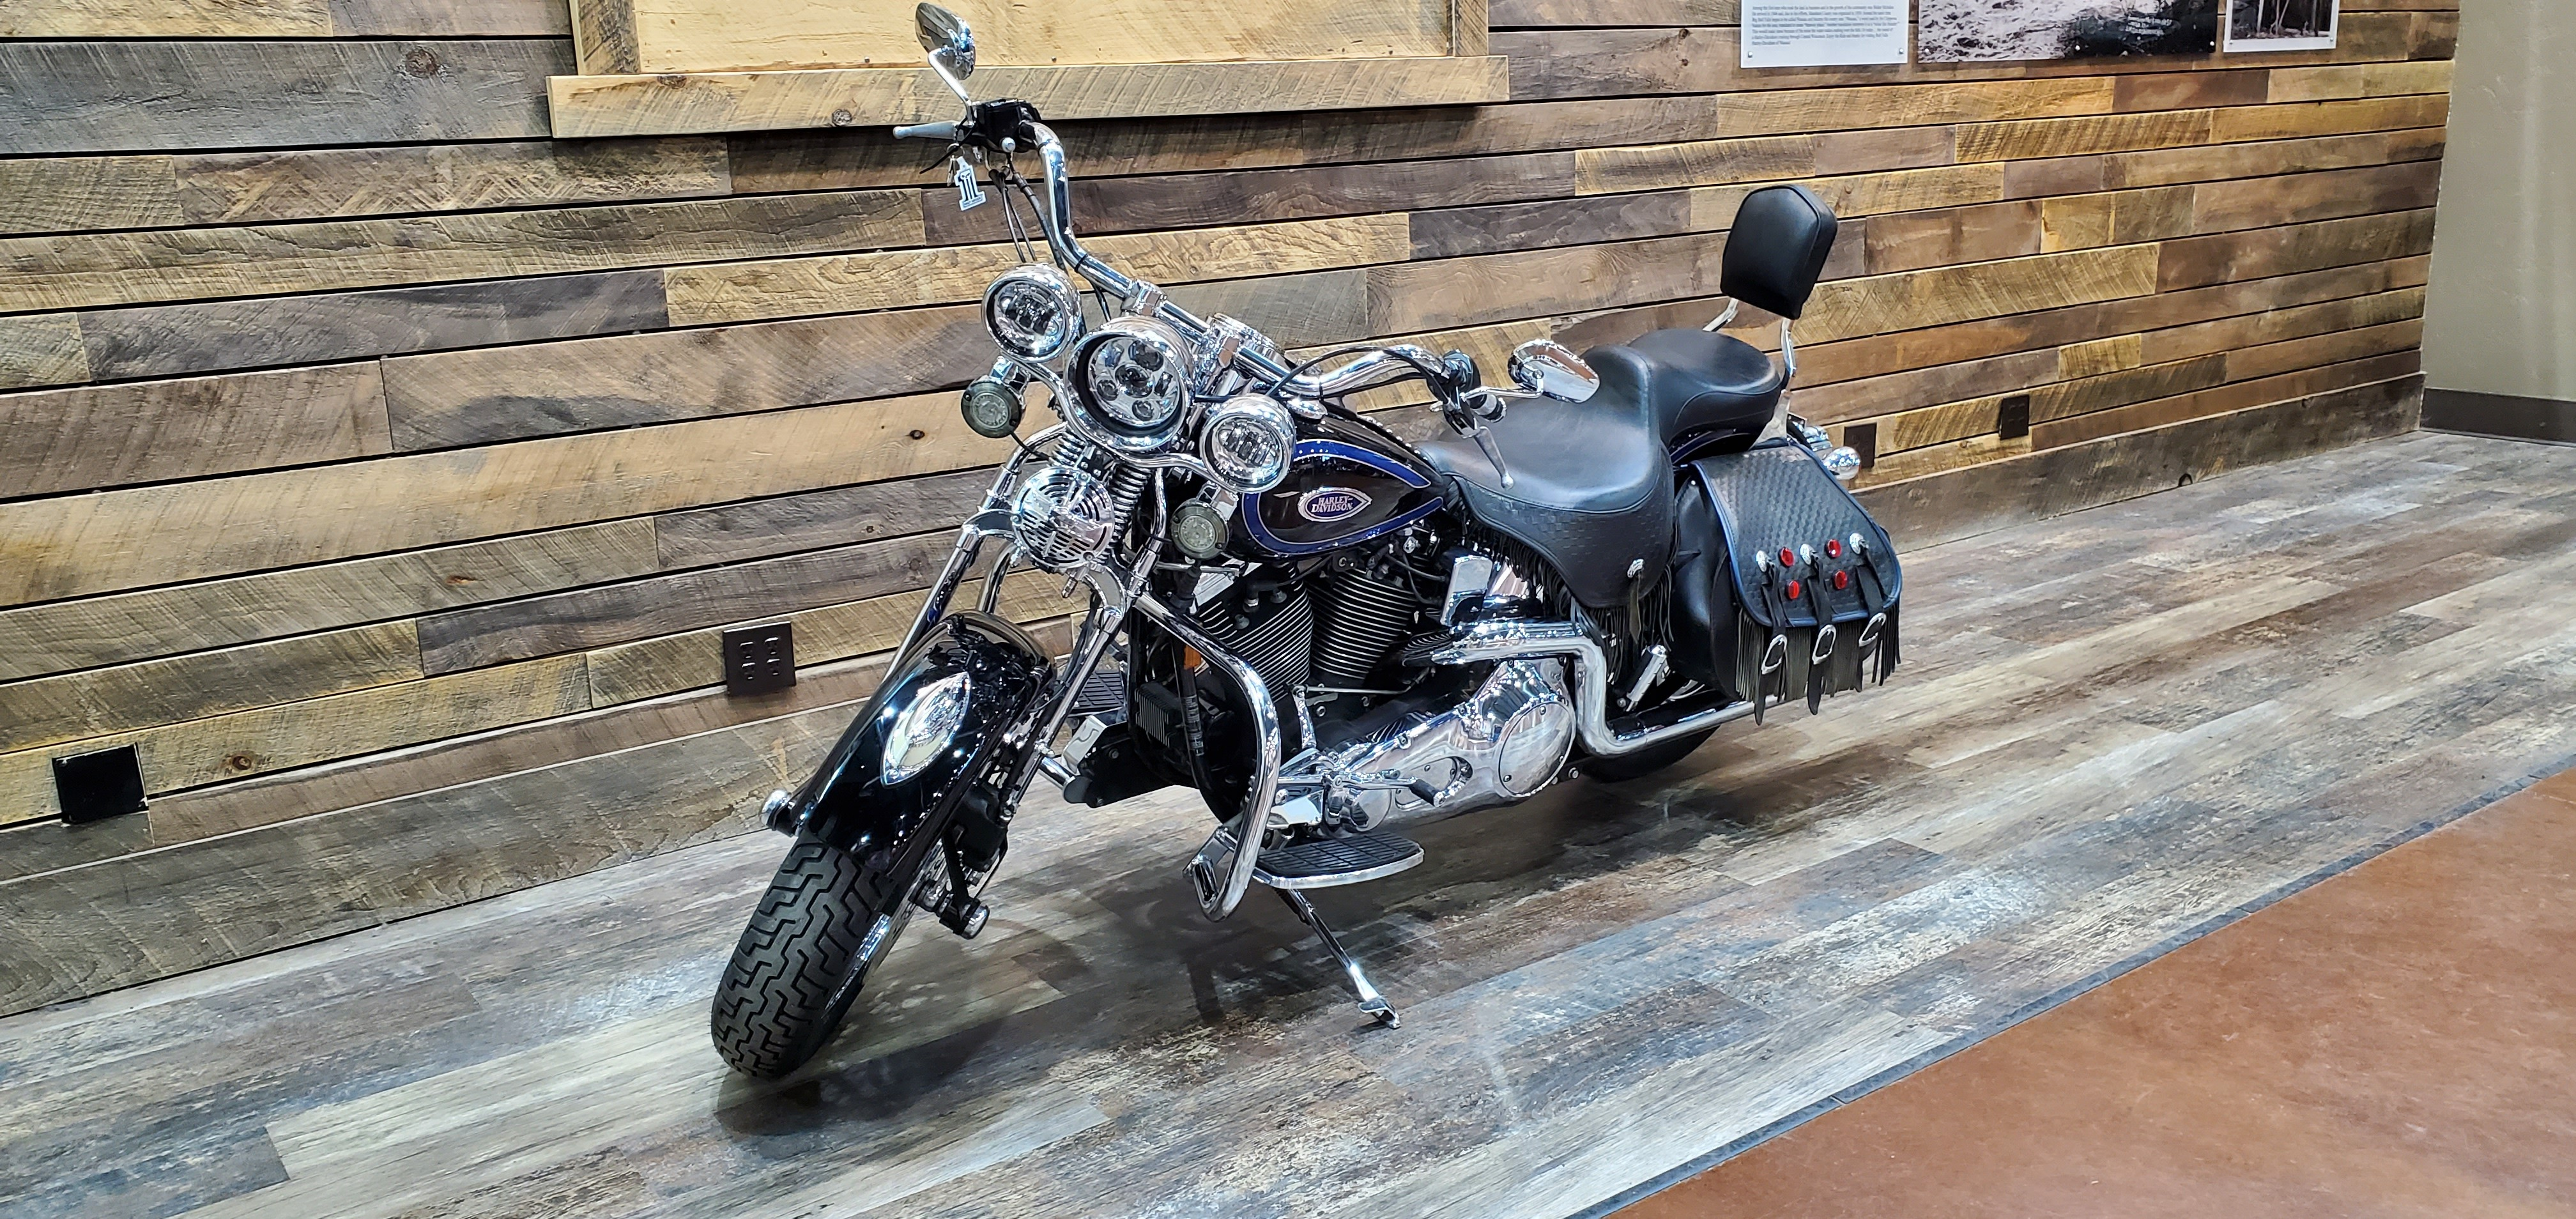 1997 Harley-Davidson FLSTS at Bull Falls Harley-Davidson